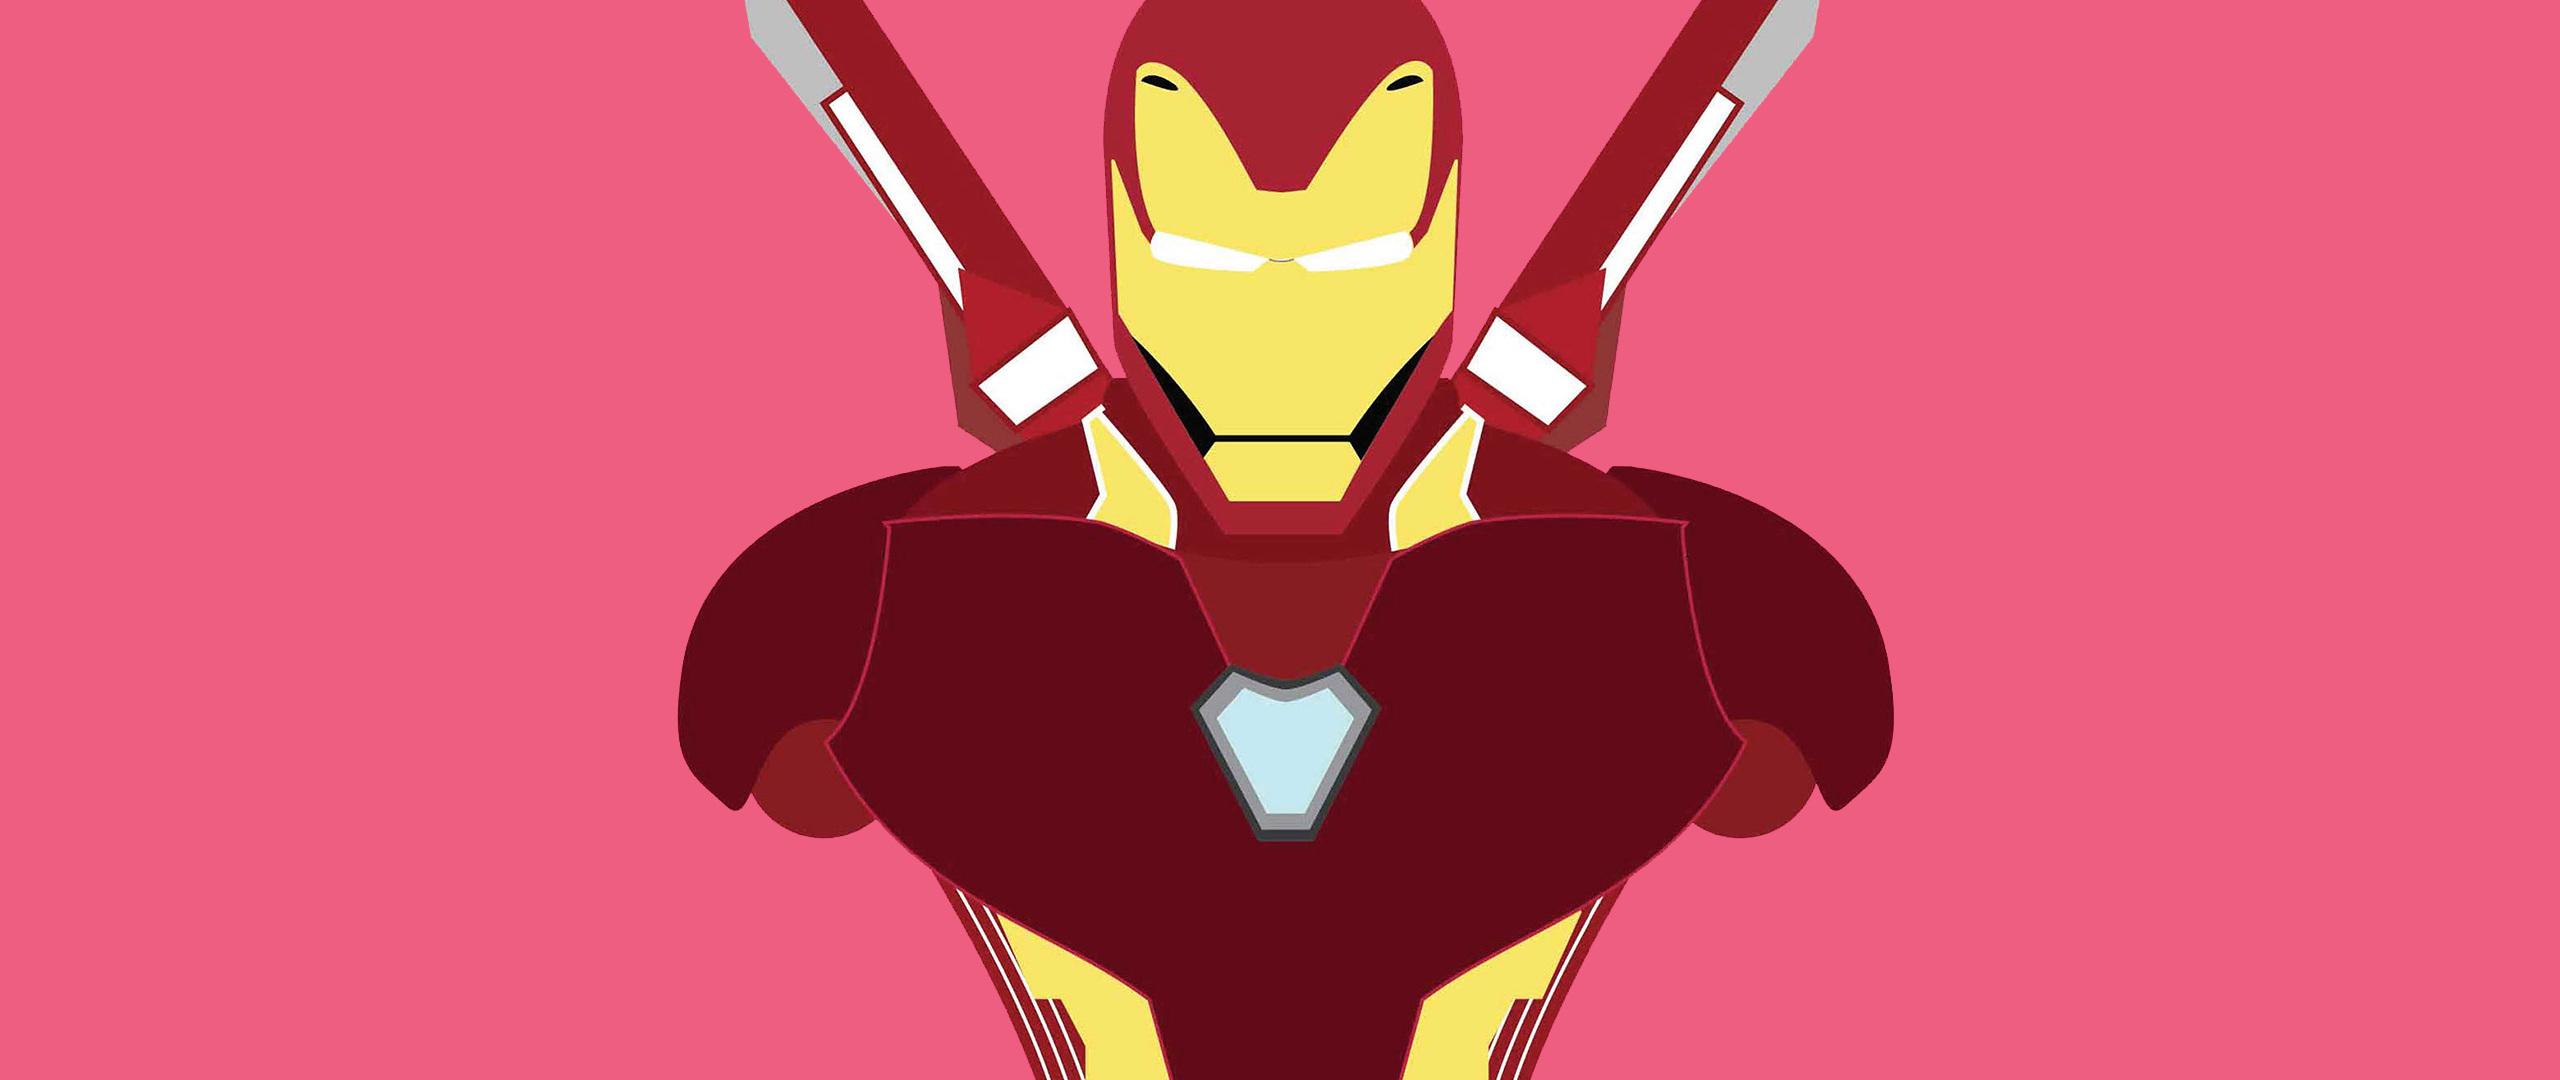 iron-man-suit-minimalism-cp.jpg